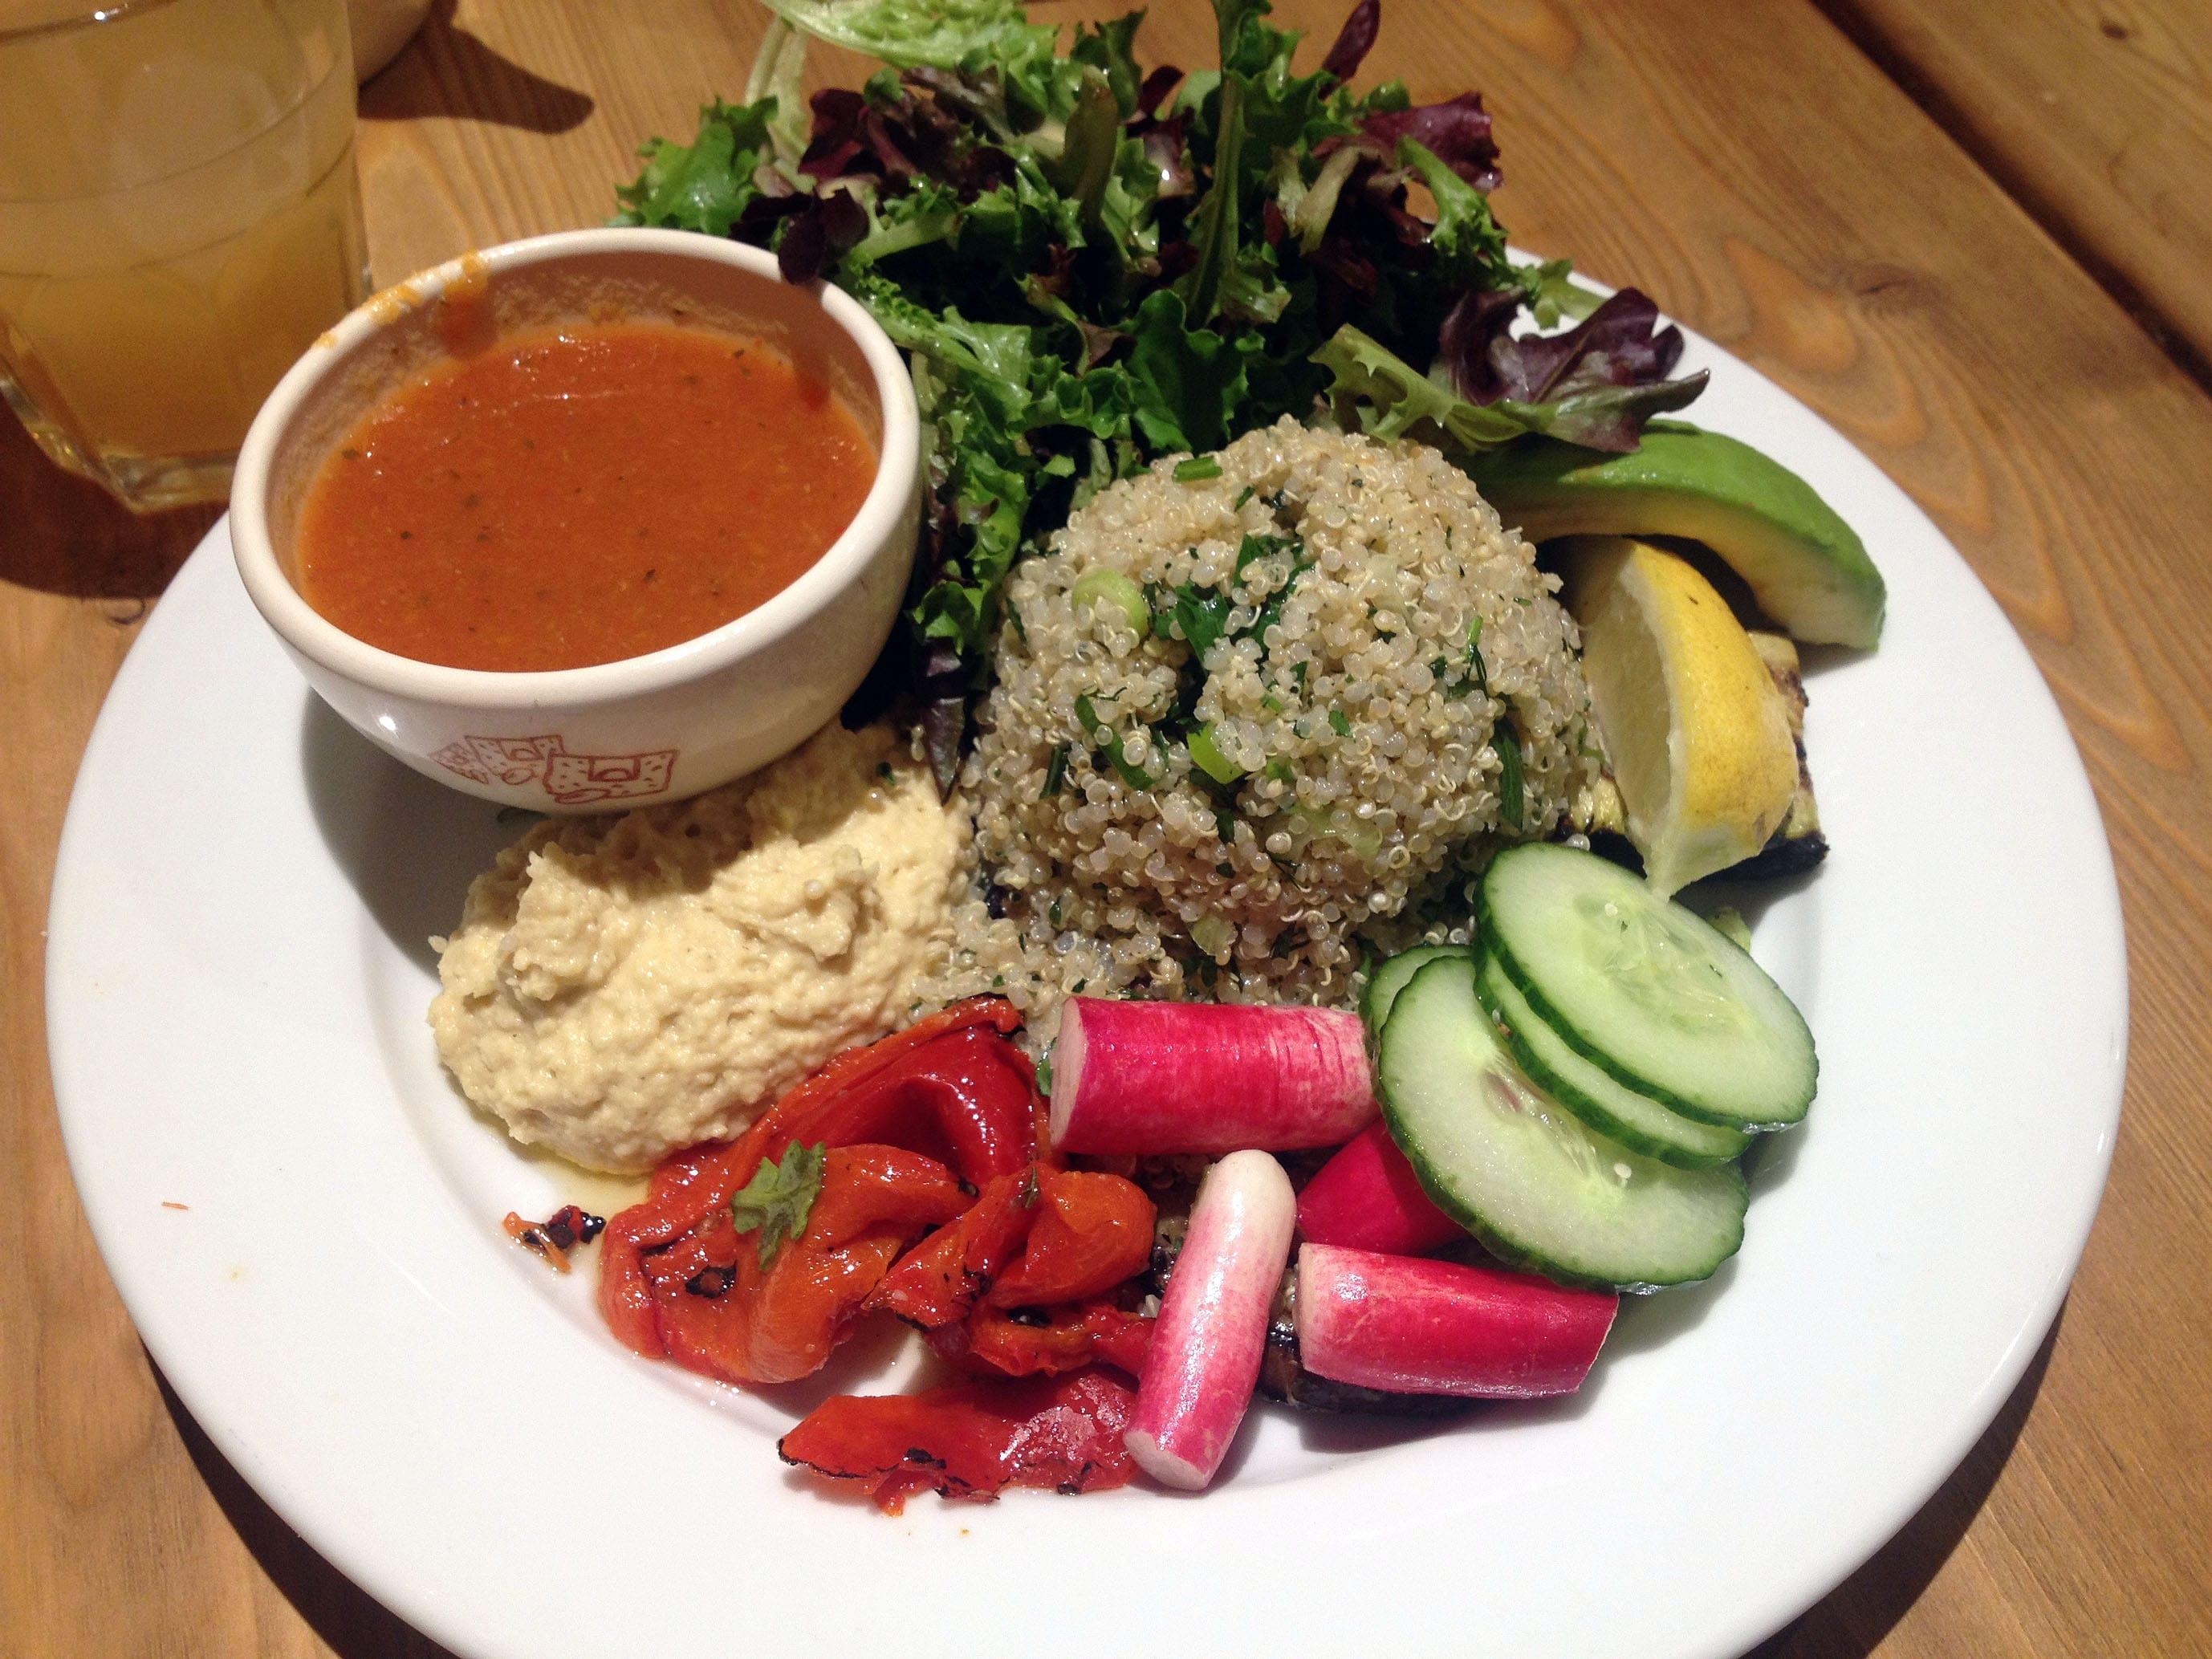 gluten free organic vegetarian brunch: Le Pain Quotidien